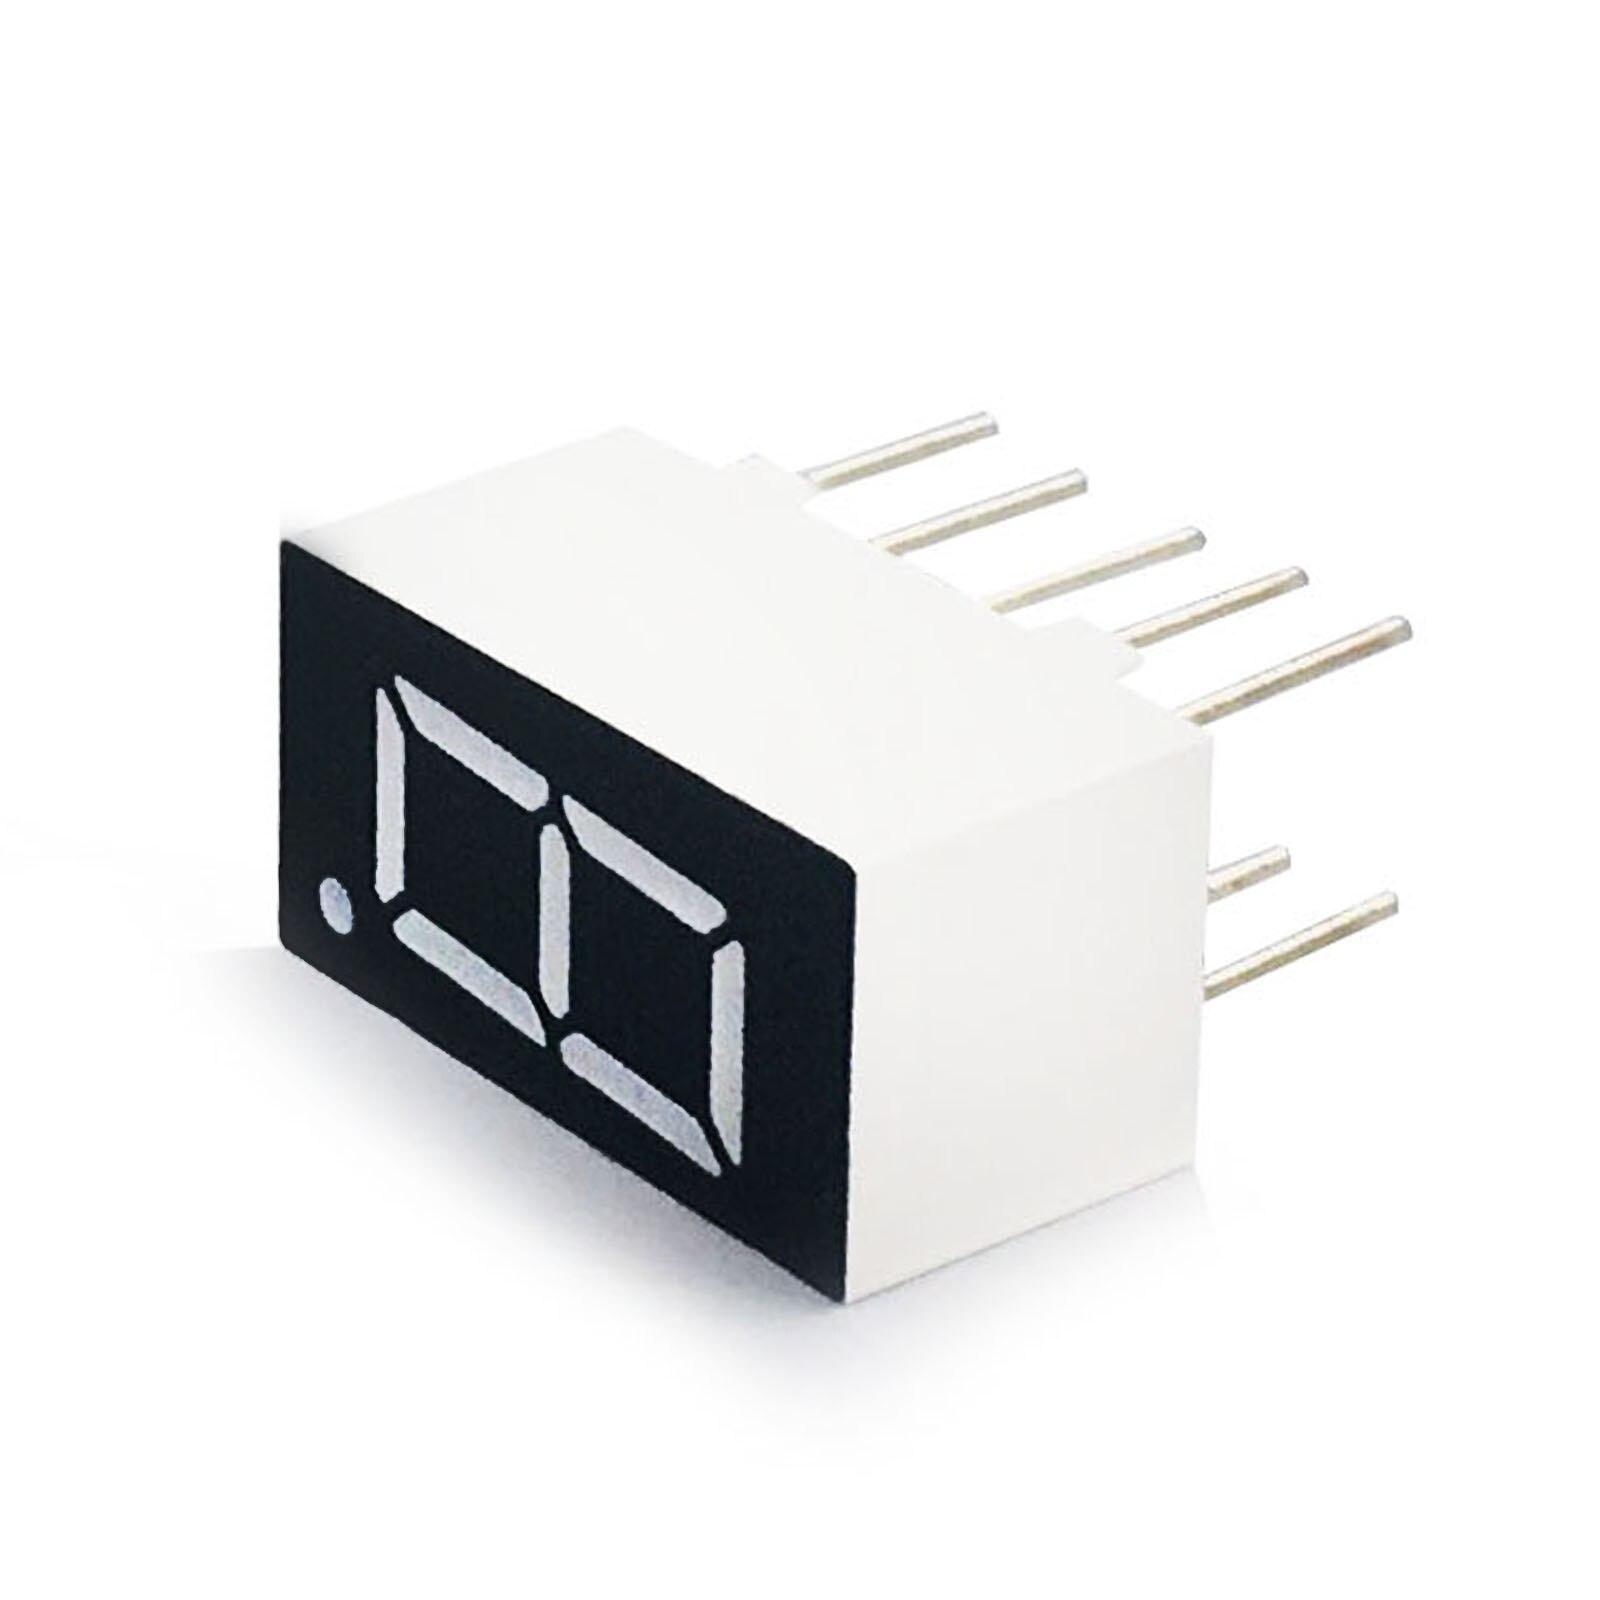 MCIGICM 100pcs 7 Segment Common Cathode 1 Bit Digital Tube 0.36